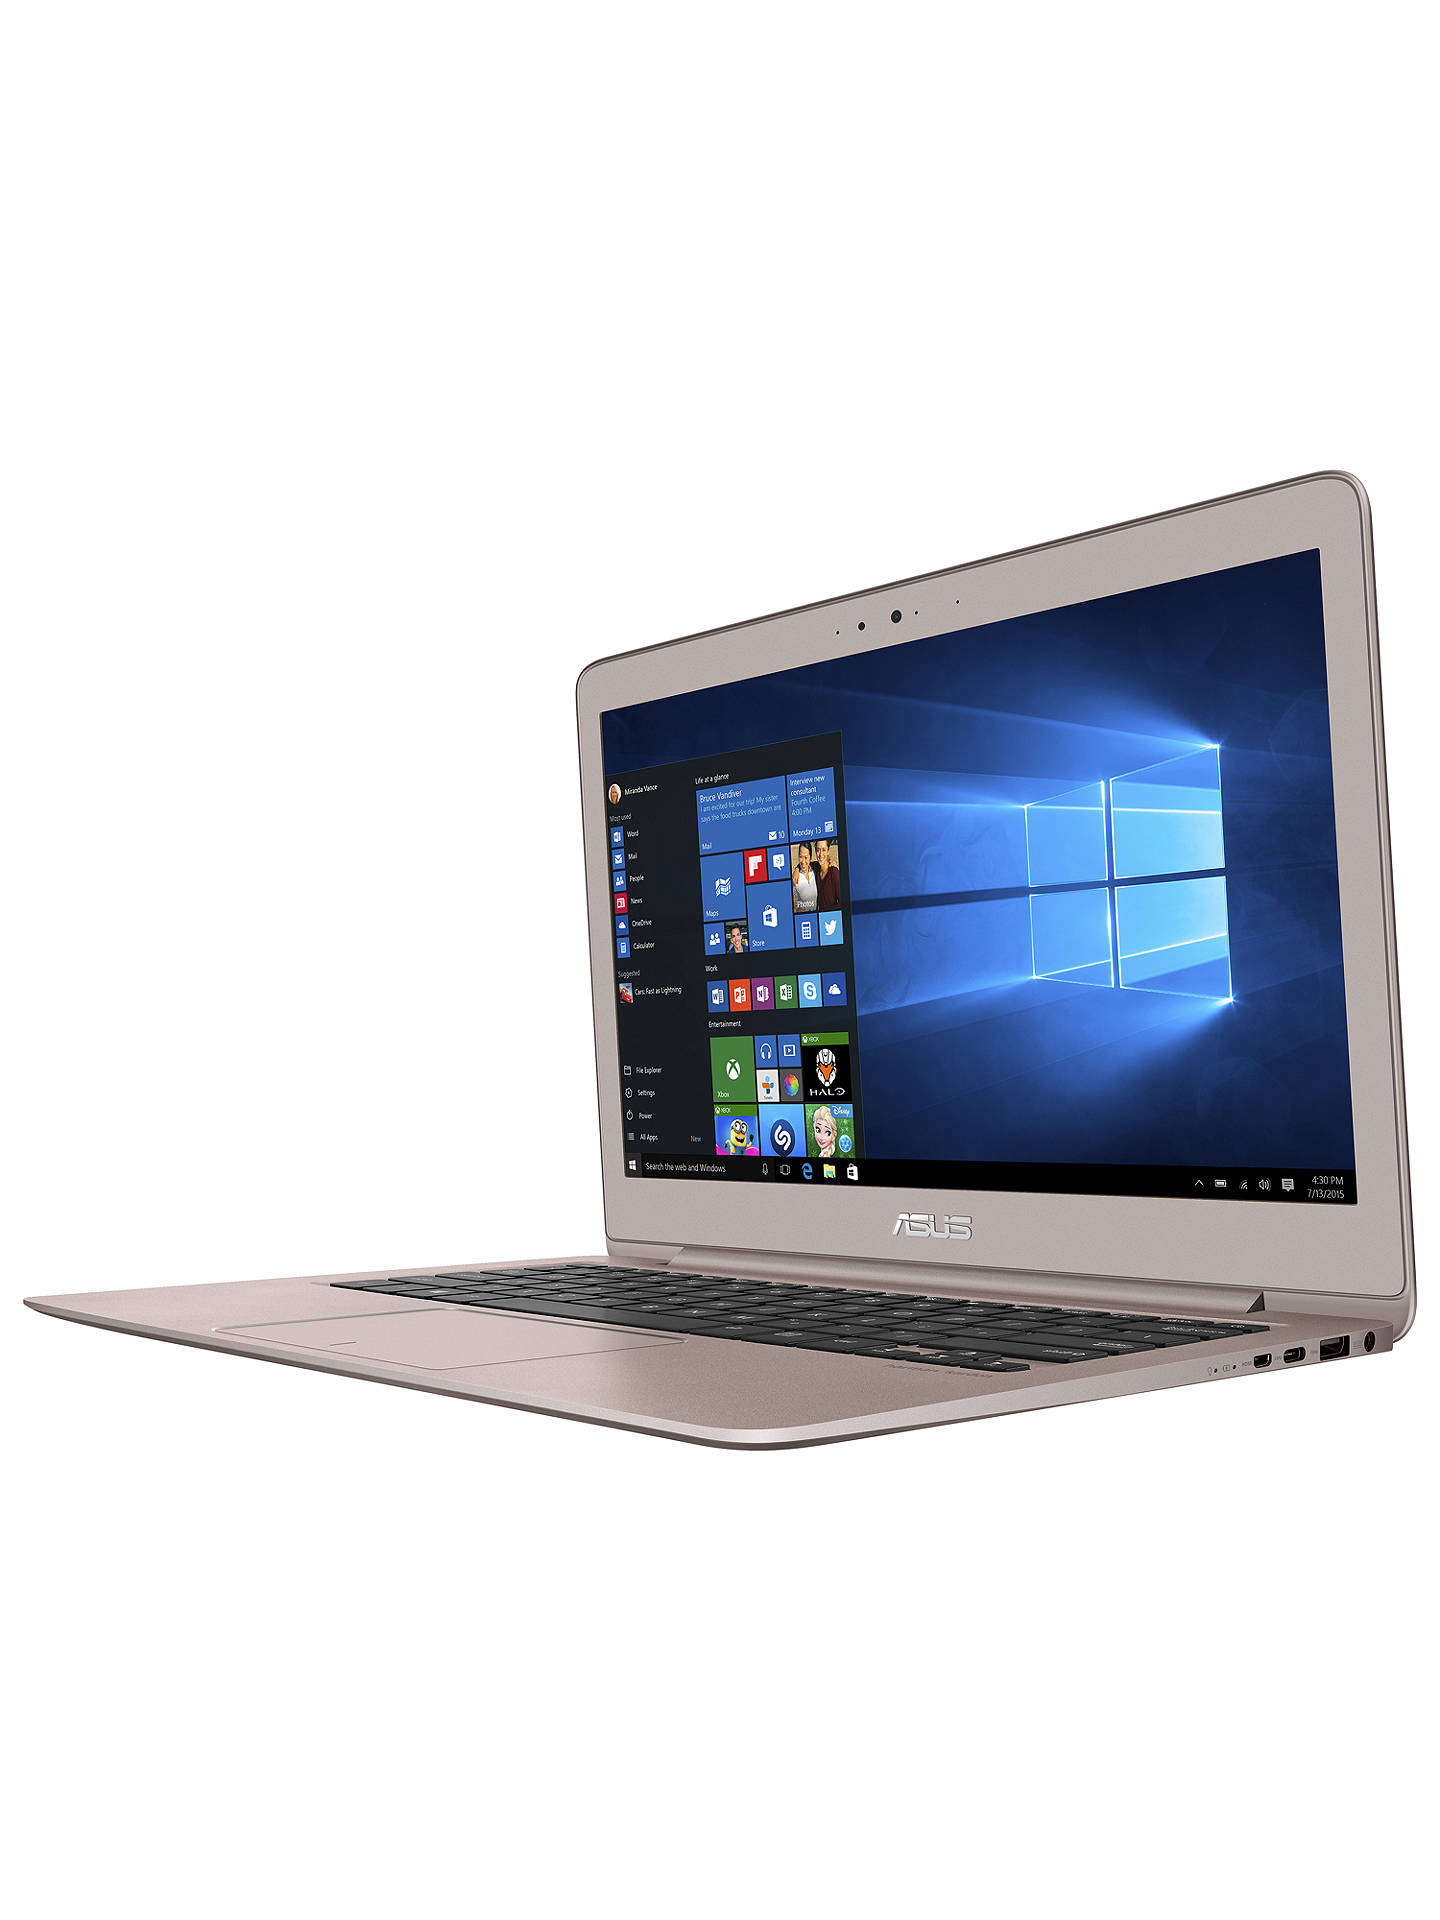 ASUS ZenBook UX330 Laptop, Intel Core i5, 8GB RAM, 256GB SSD